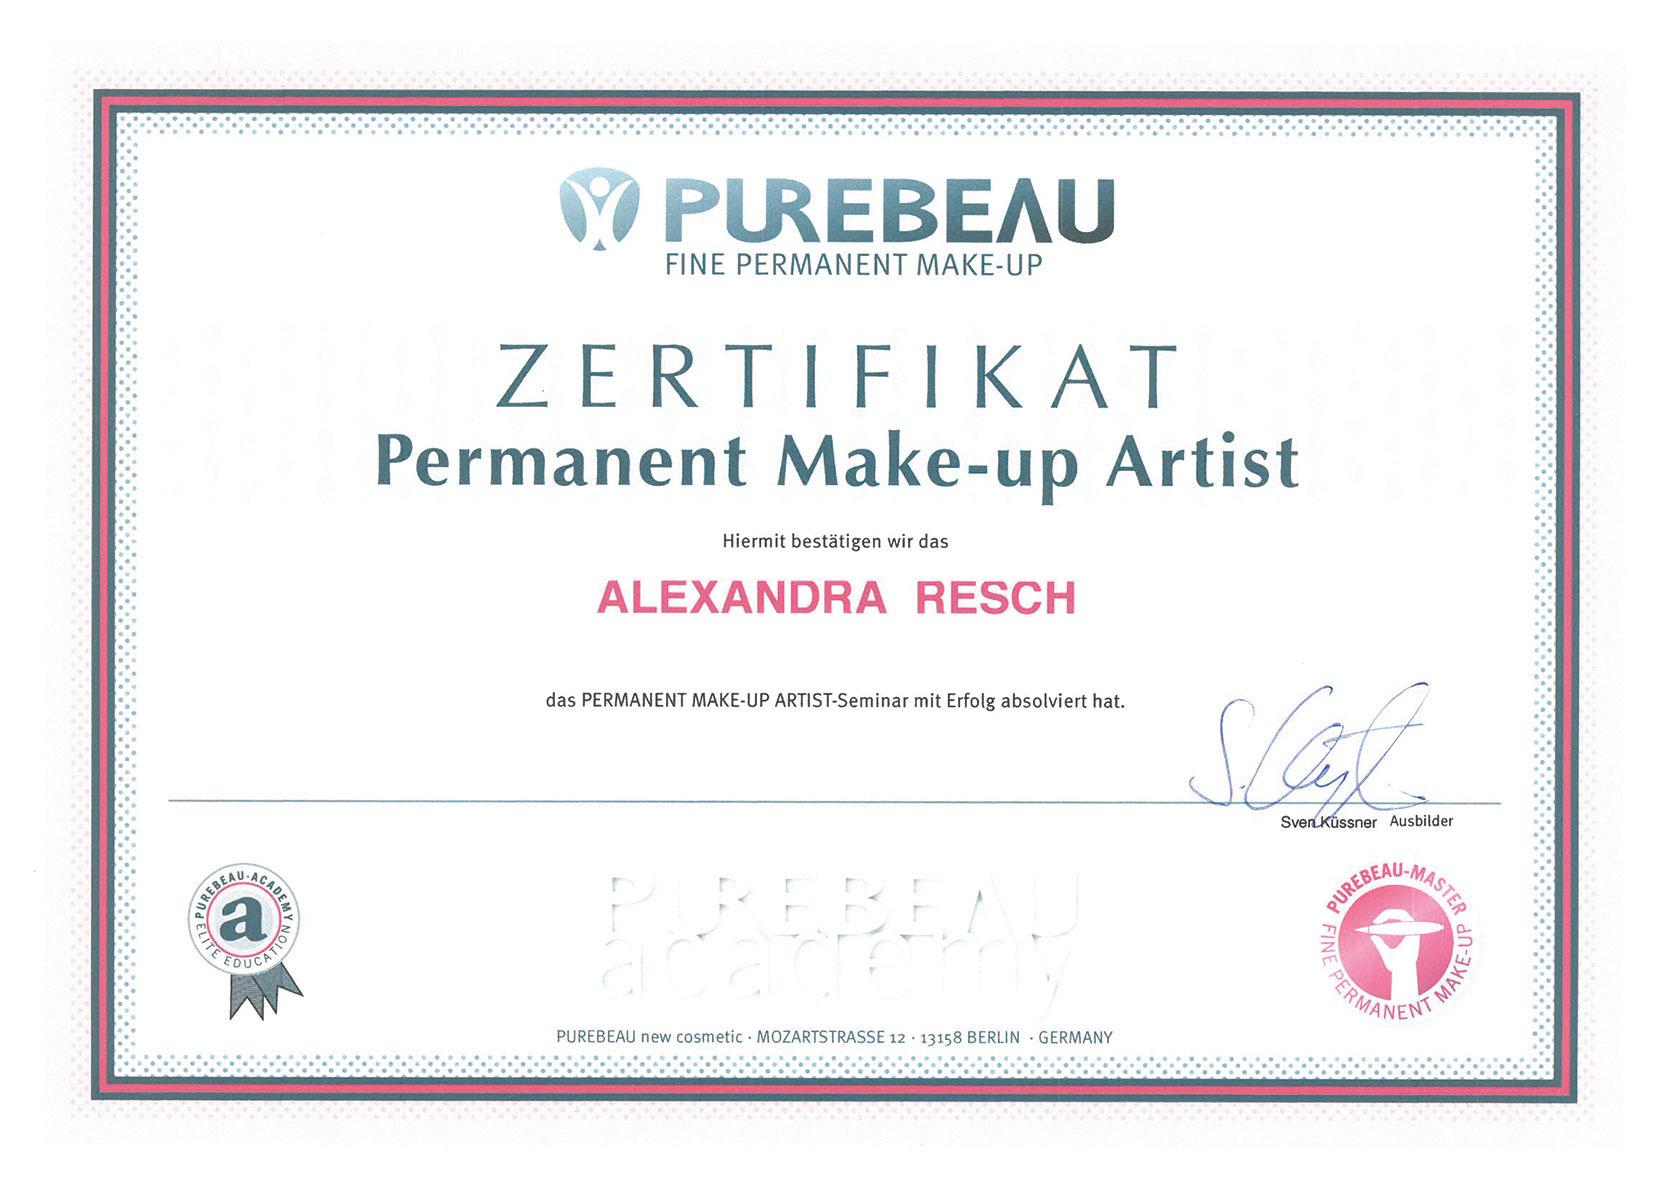 Pure Ästhetik Winnenden – Zertifikat –Permanent Make-up Artist